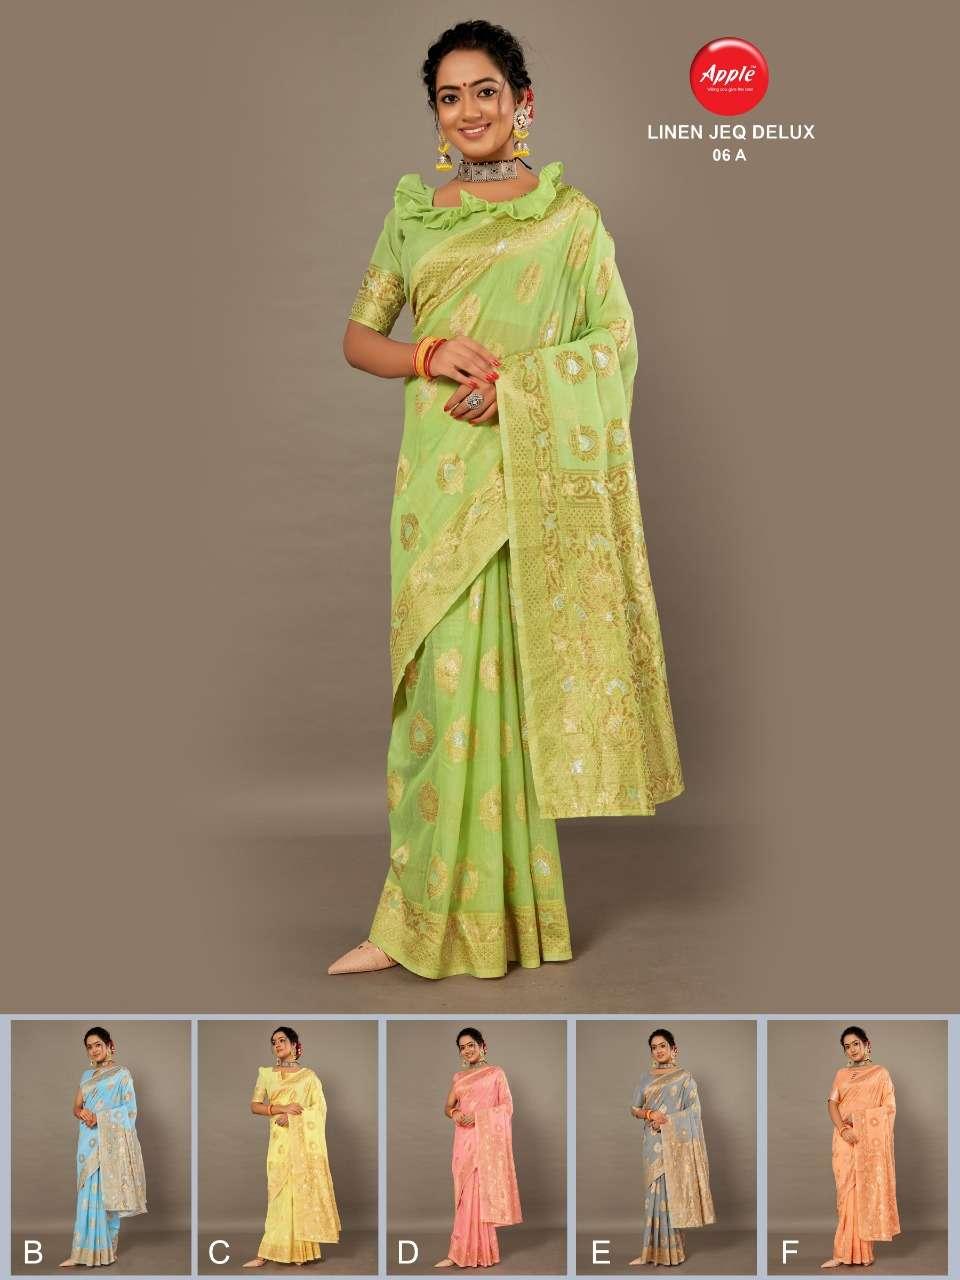 apple linen jaqauard delux fancy saree with zari border